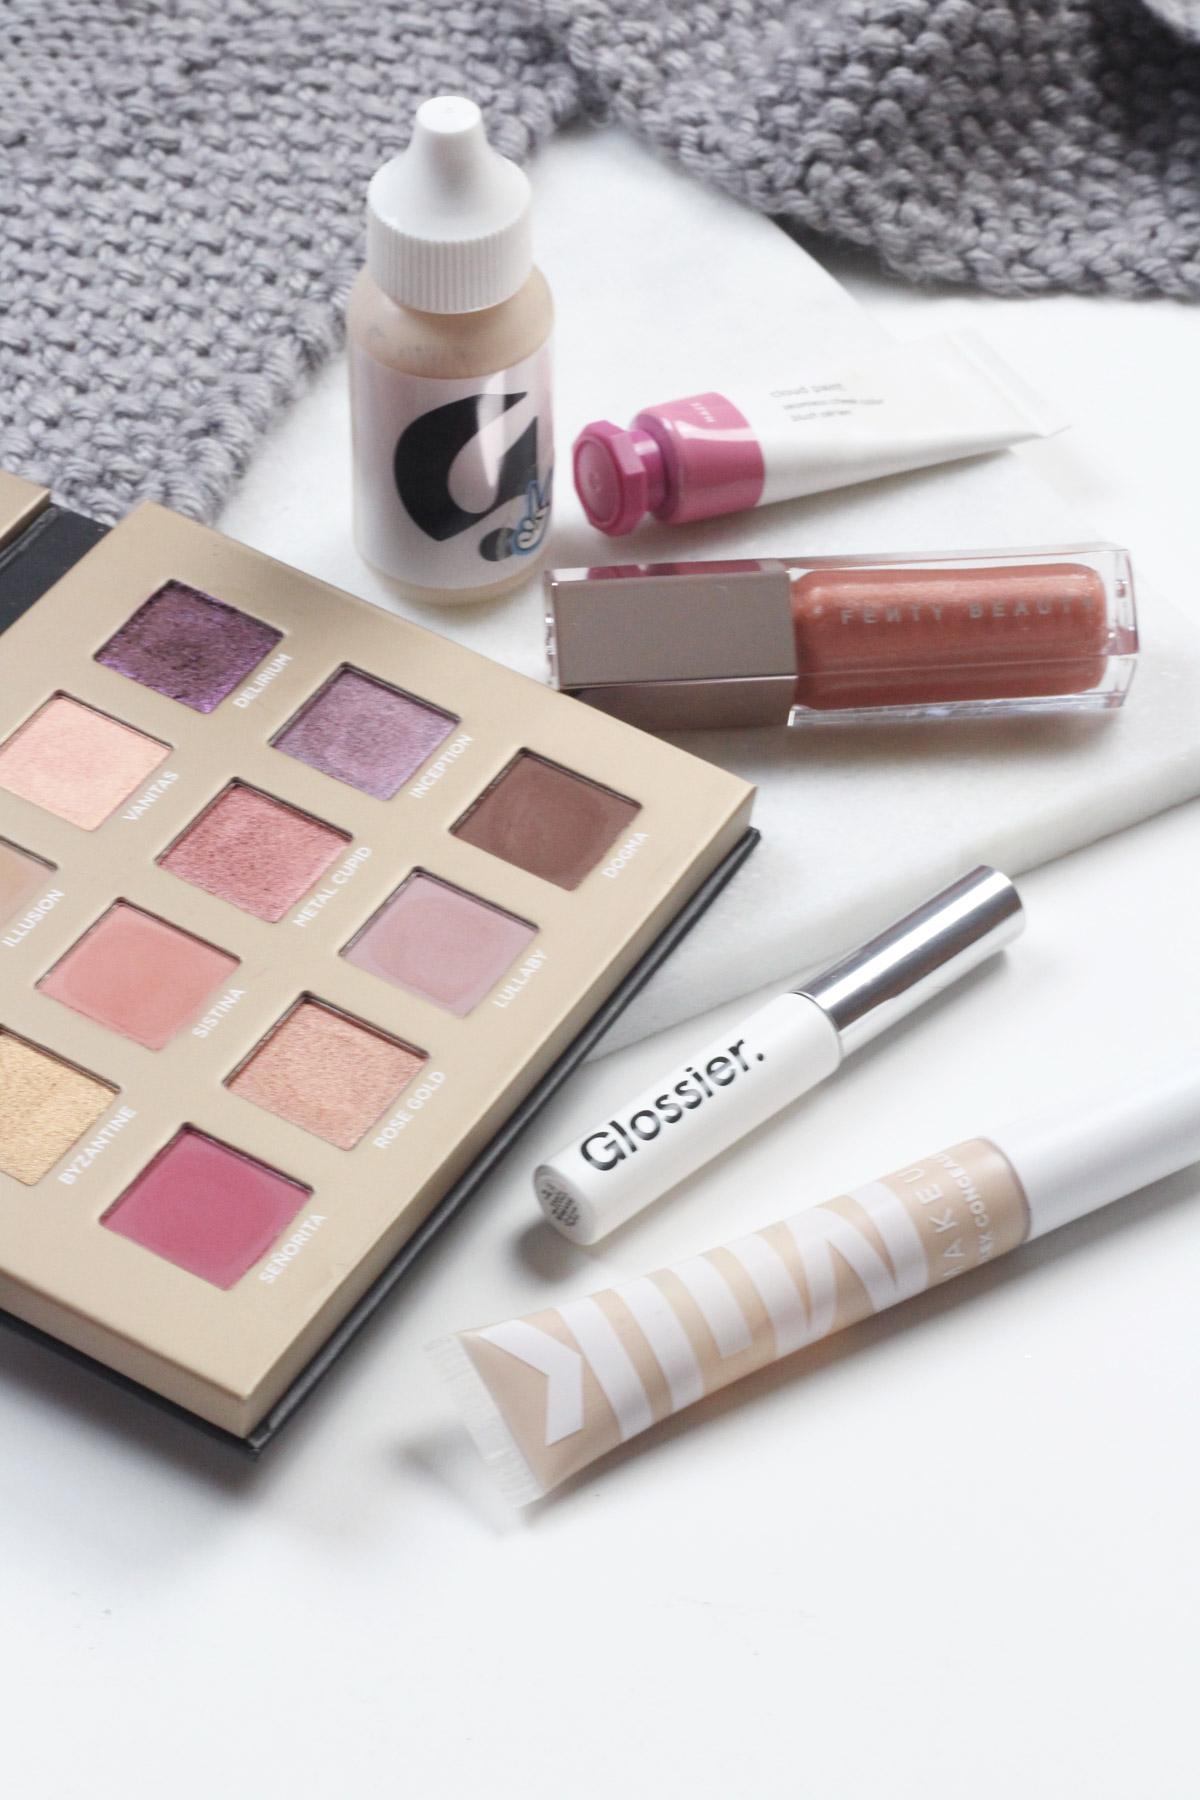 in-my-makeup-bag-3.jpg